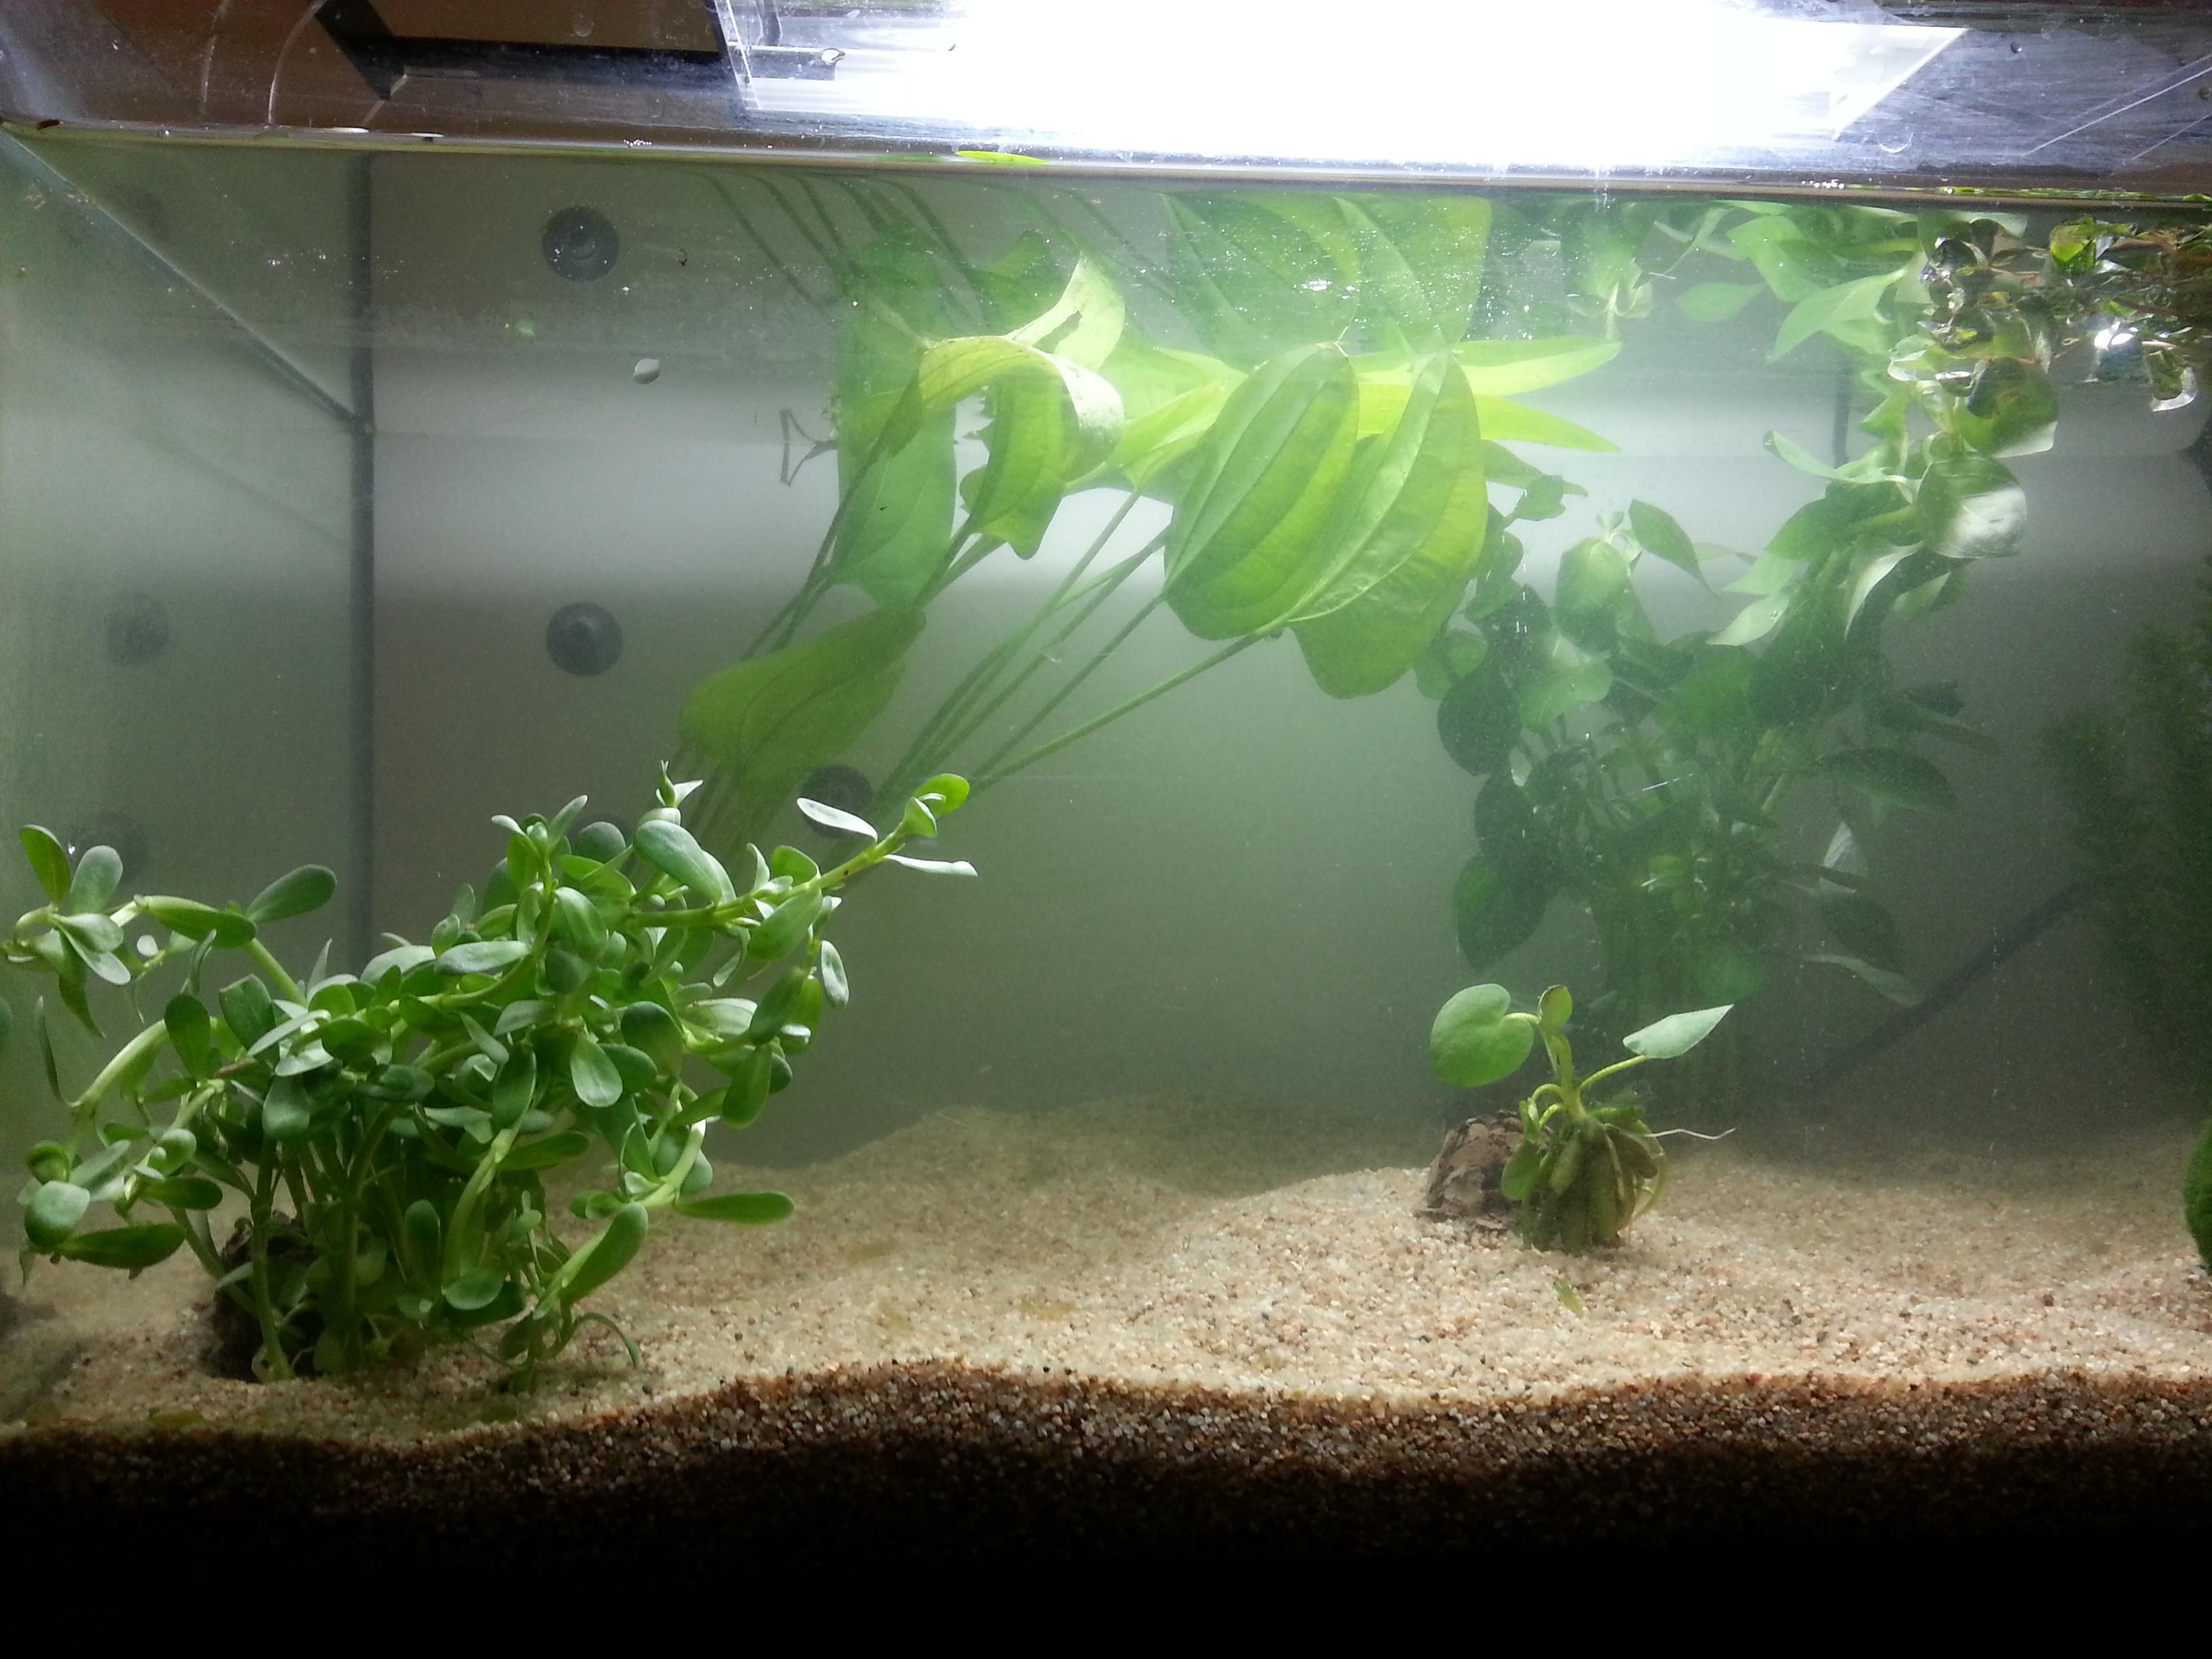 plante dans un aquarium 69043220130613003124